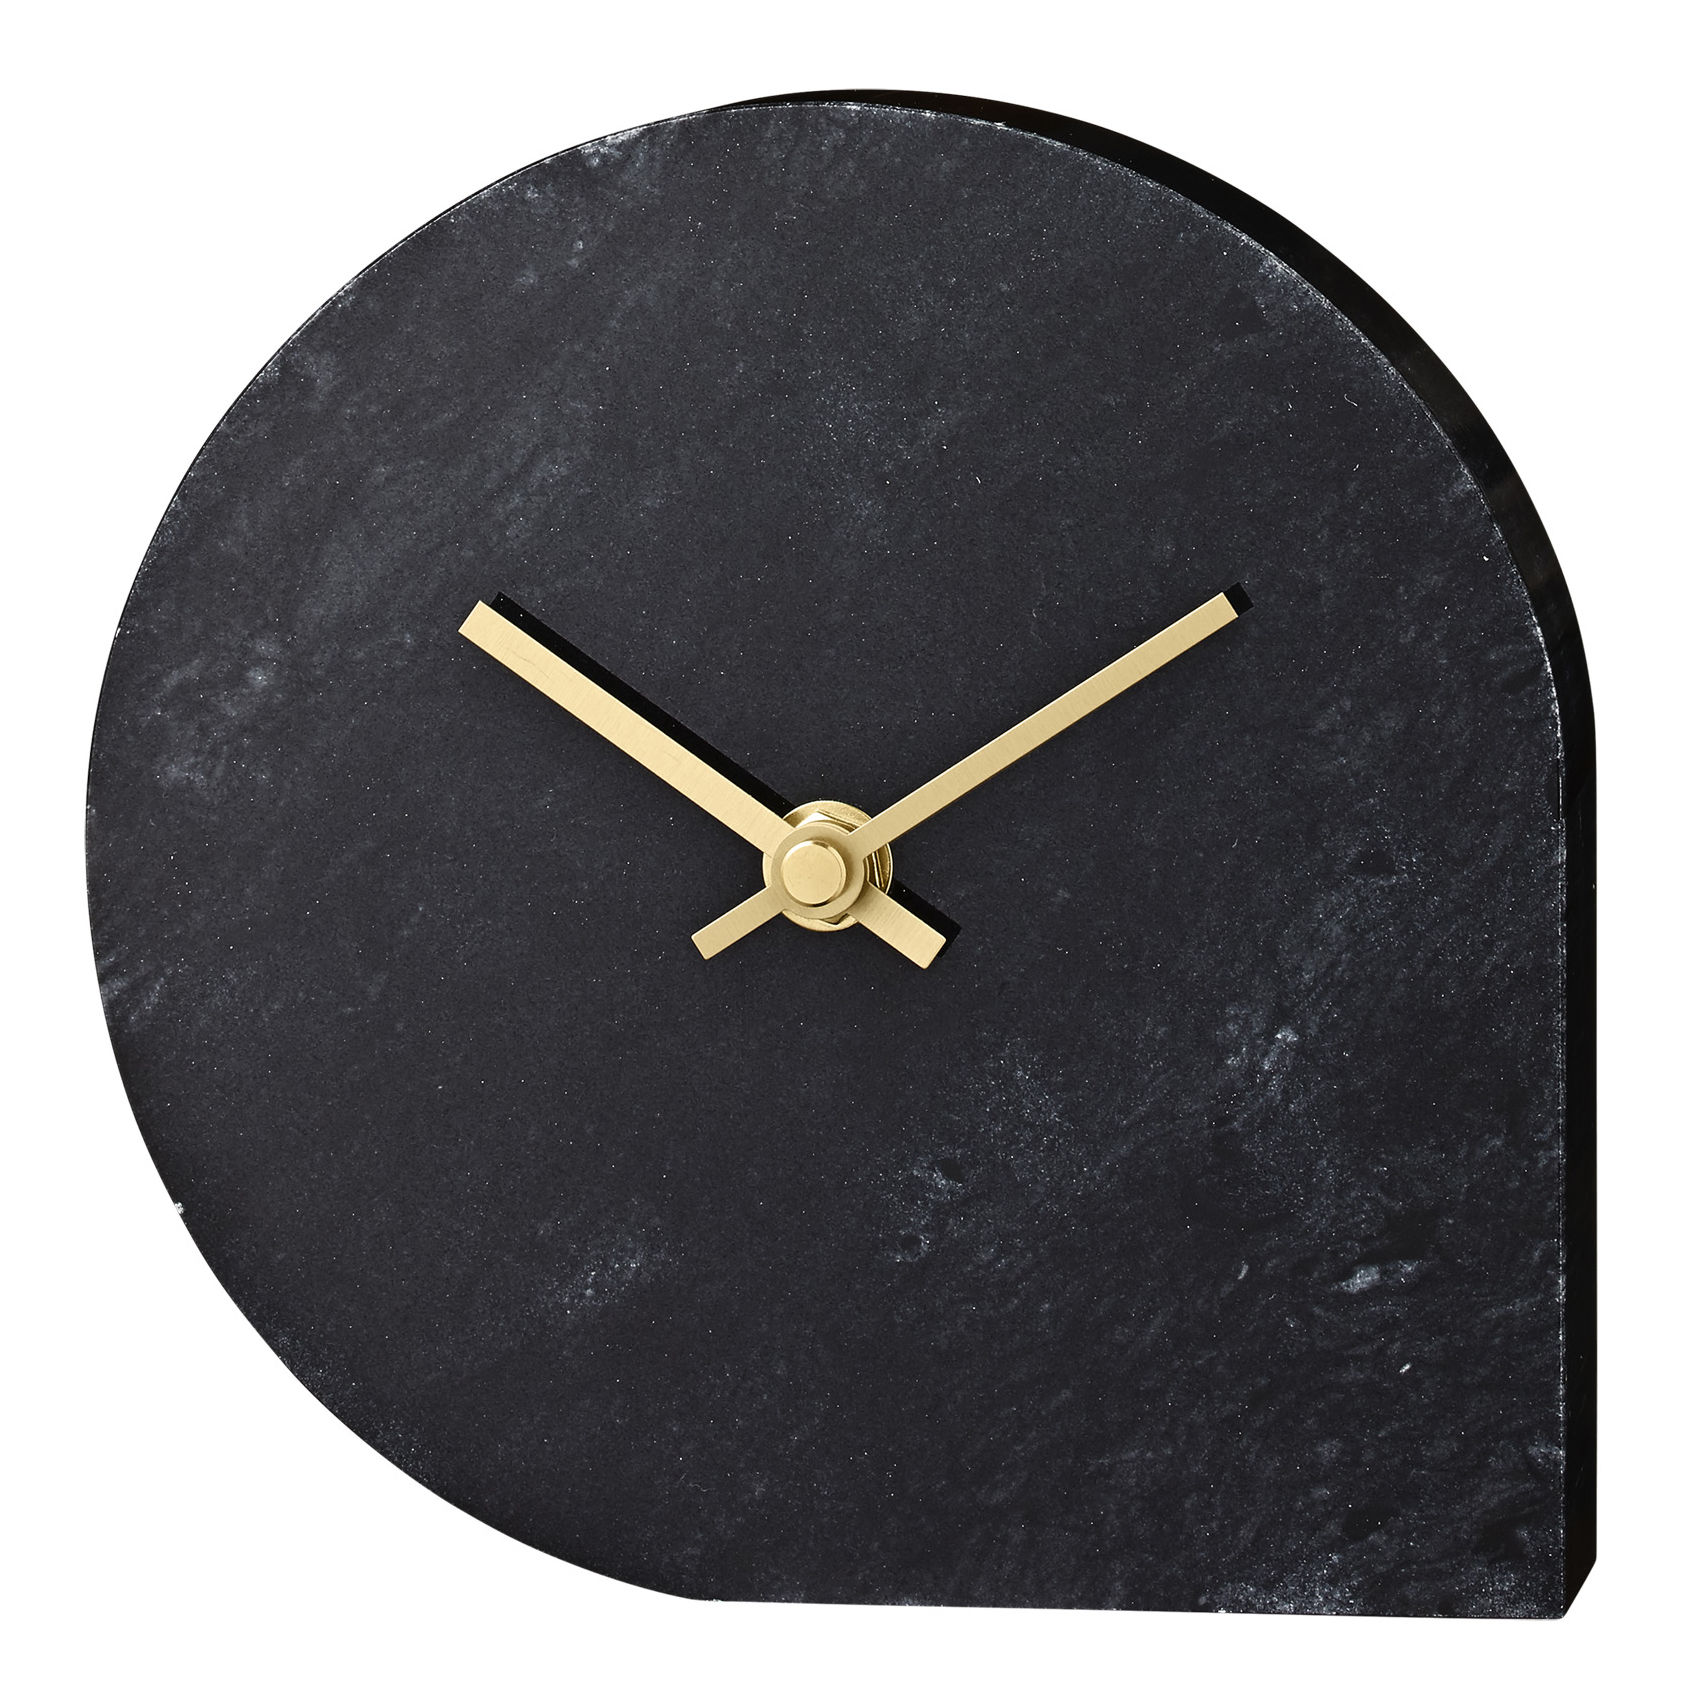 Interni - Orologi  - Orologio a parete Stilla / Marmo - Ø 16 cm - AYTM - Marmo nero / Lancette dorate - Marmo, Metallo dorato